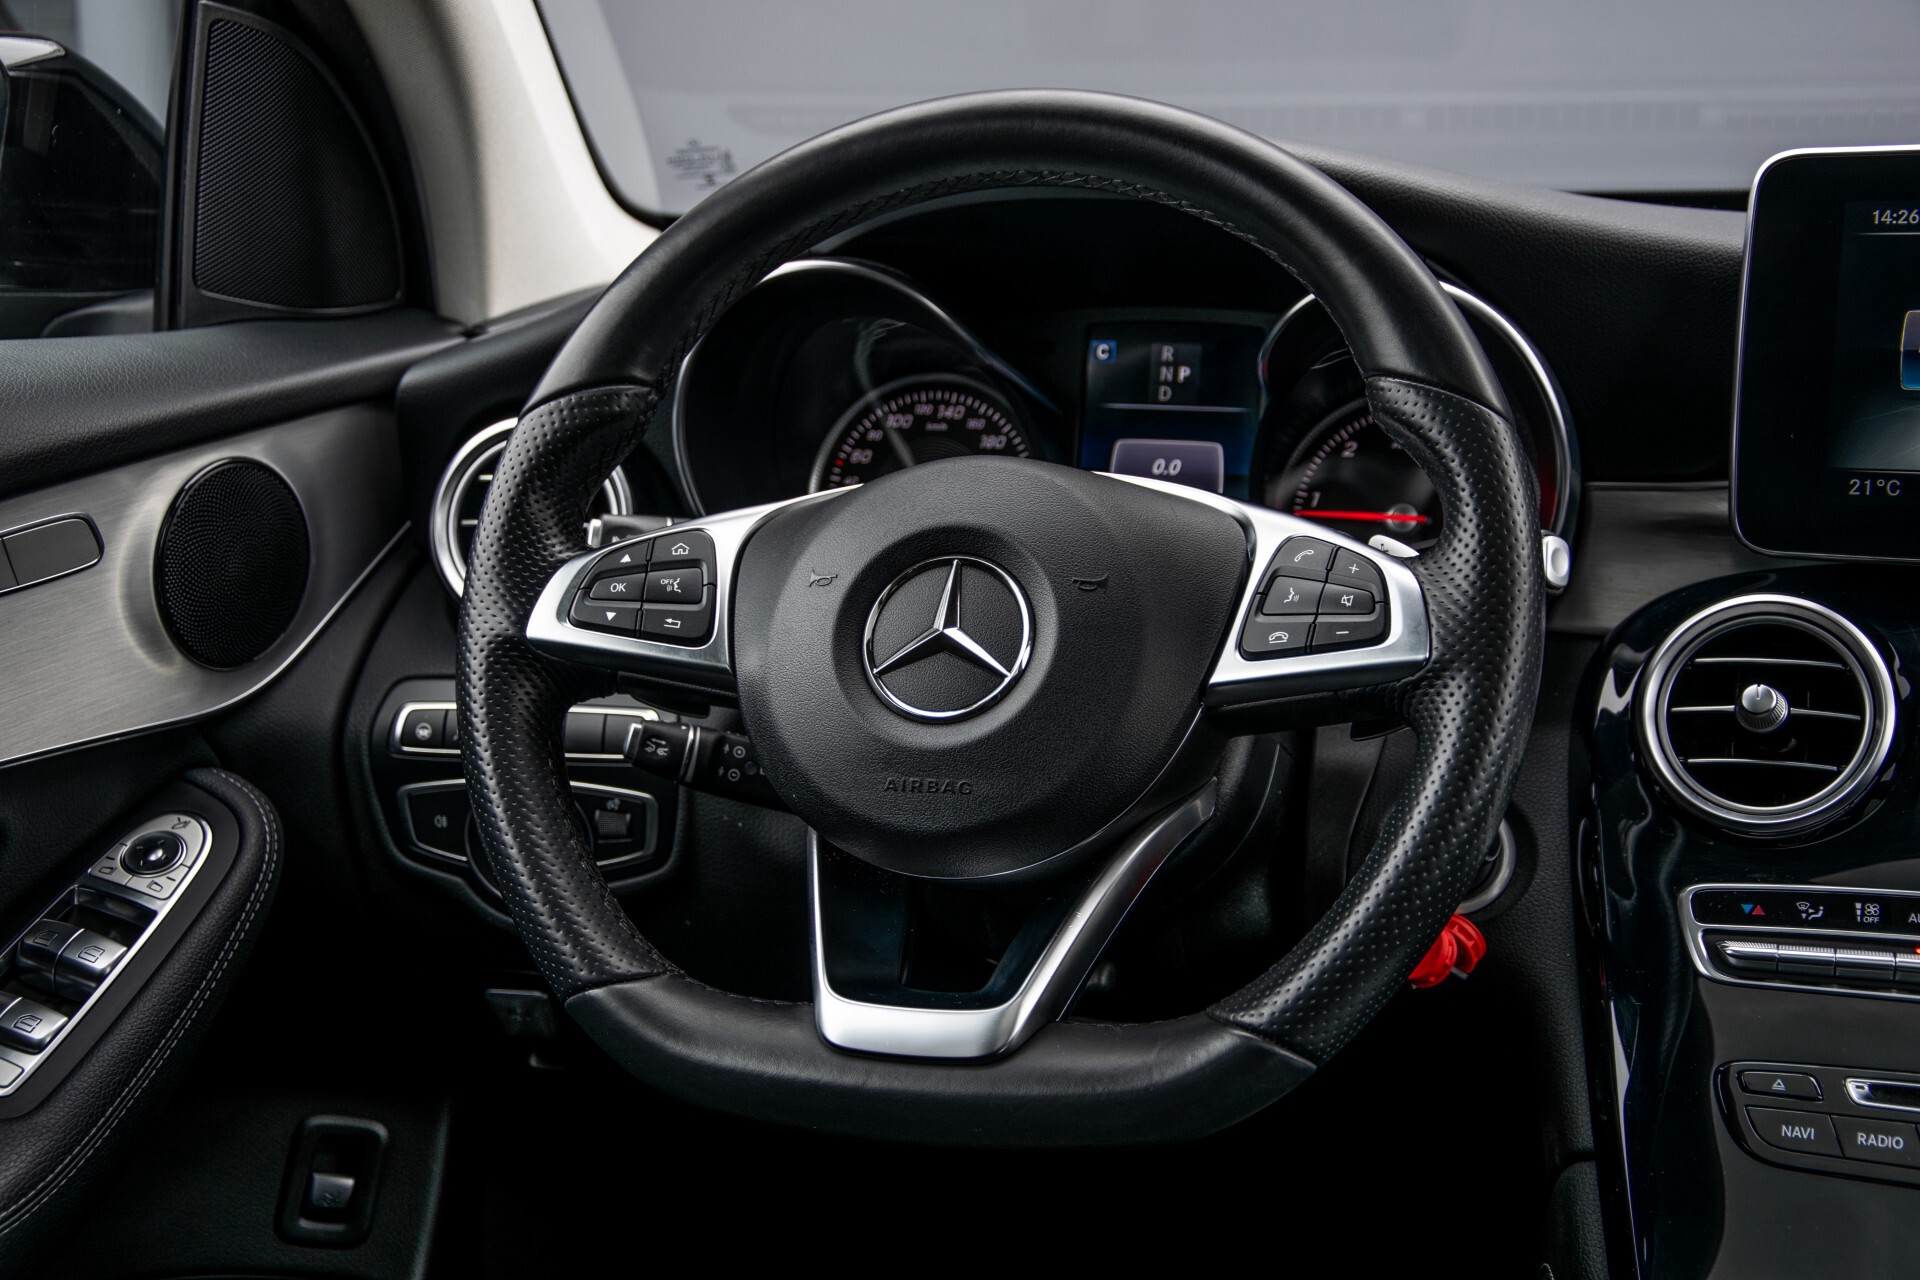 Mercedes-Benz GLC 220 d 4-M AMG/Distronic/Panorama/Comand/HUD/Afn-Trhk Aut9 Foto 8